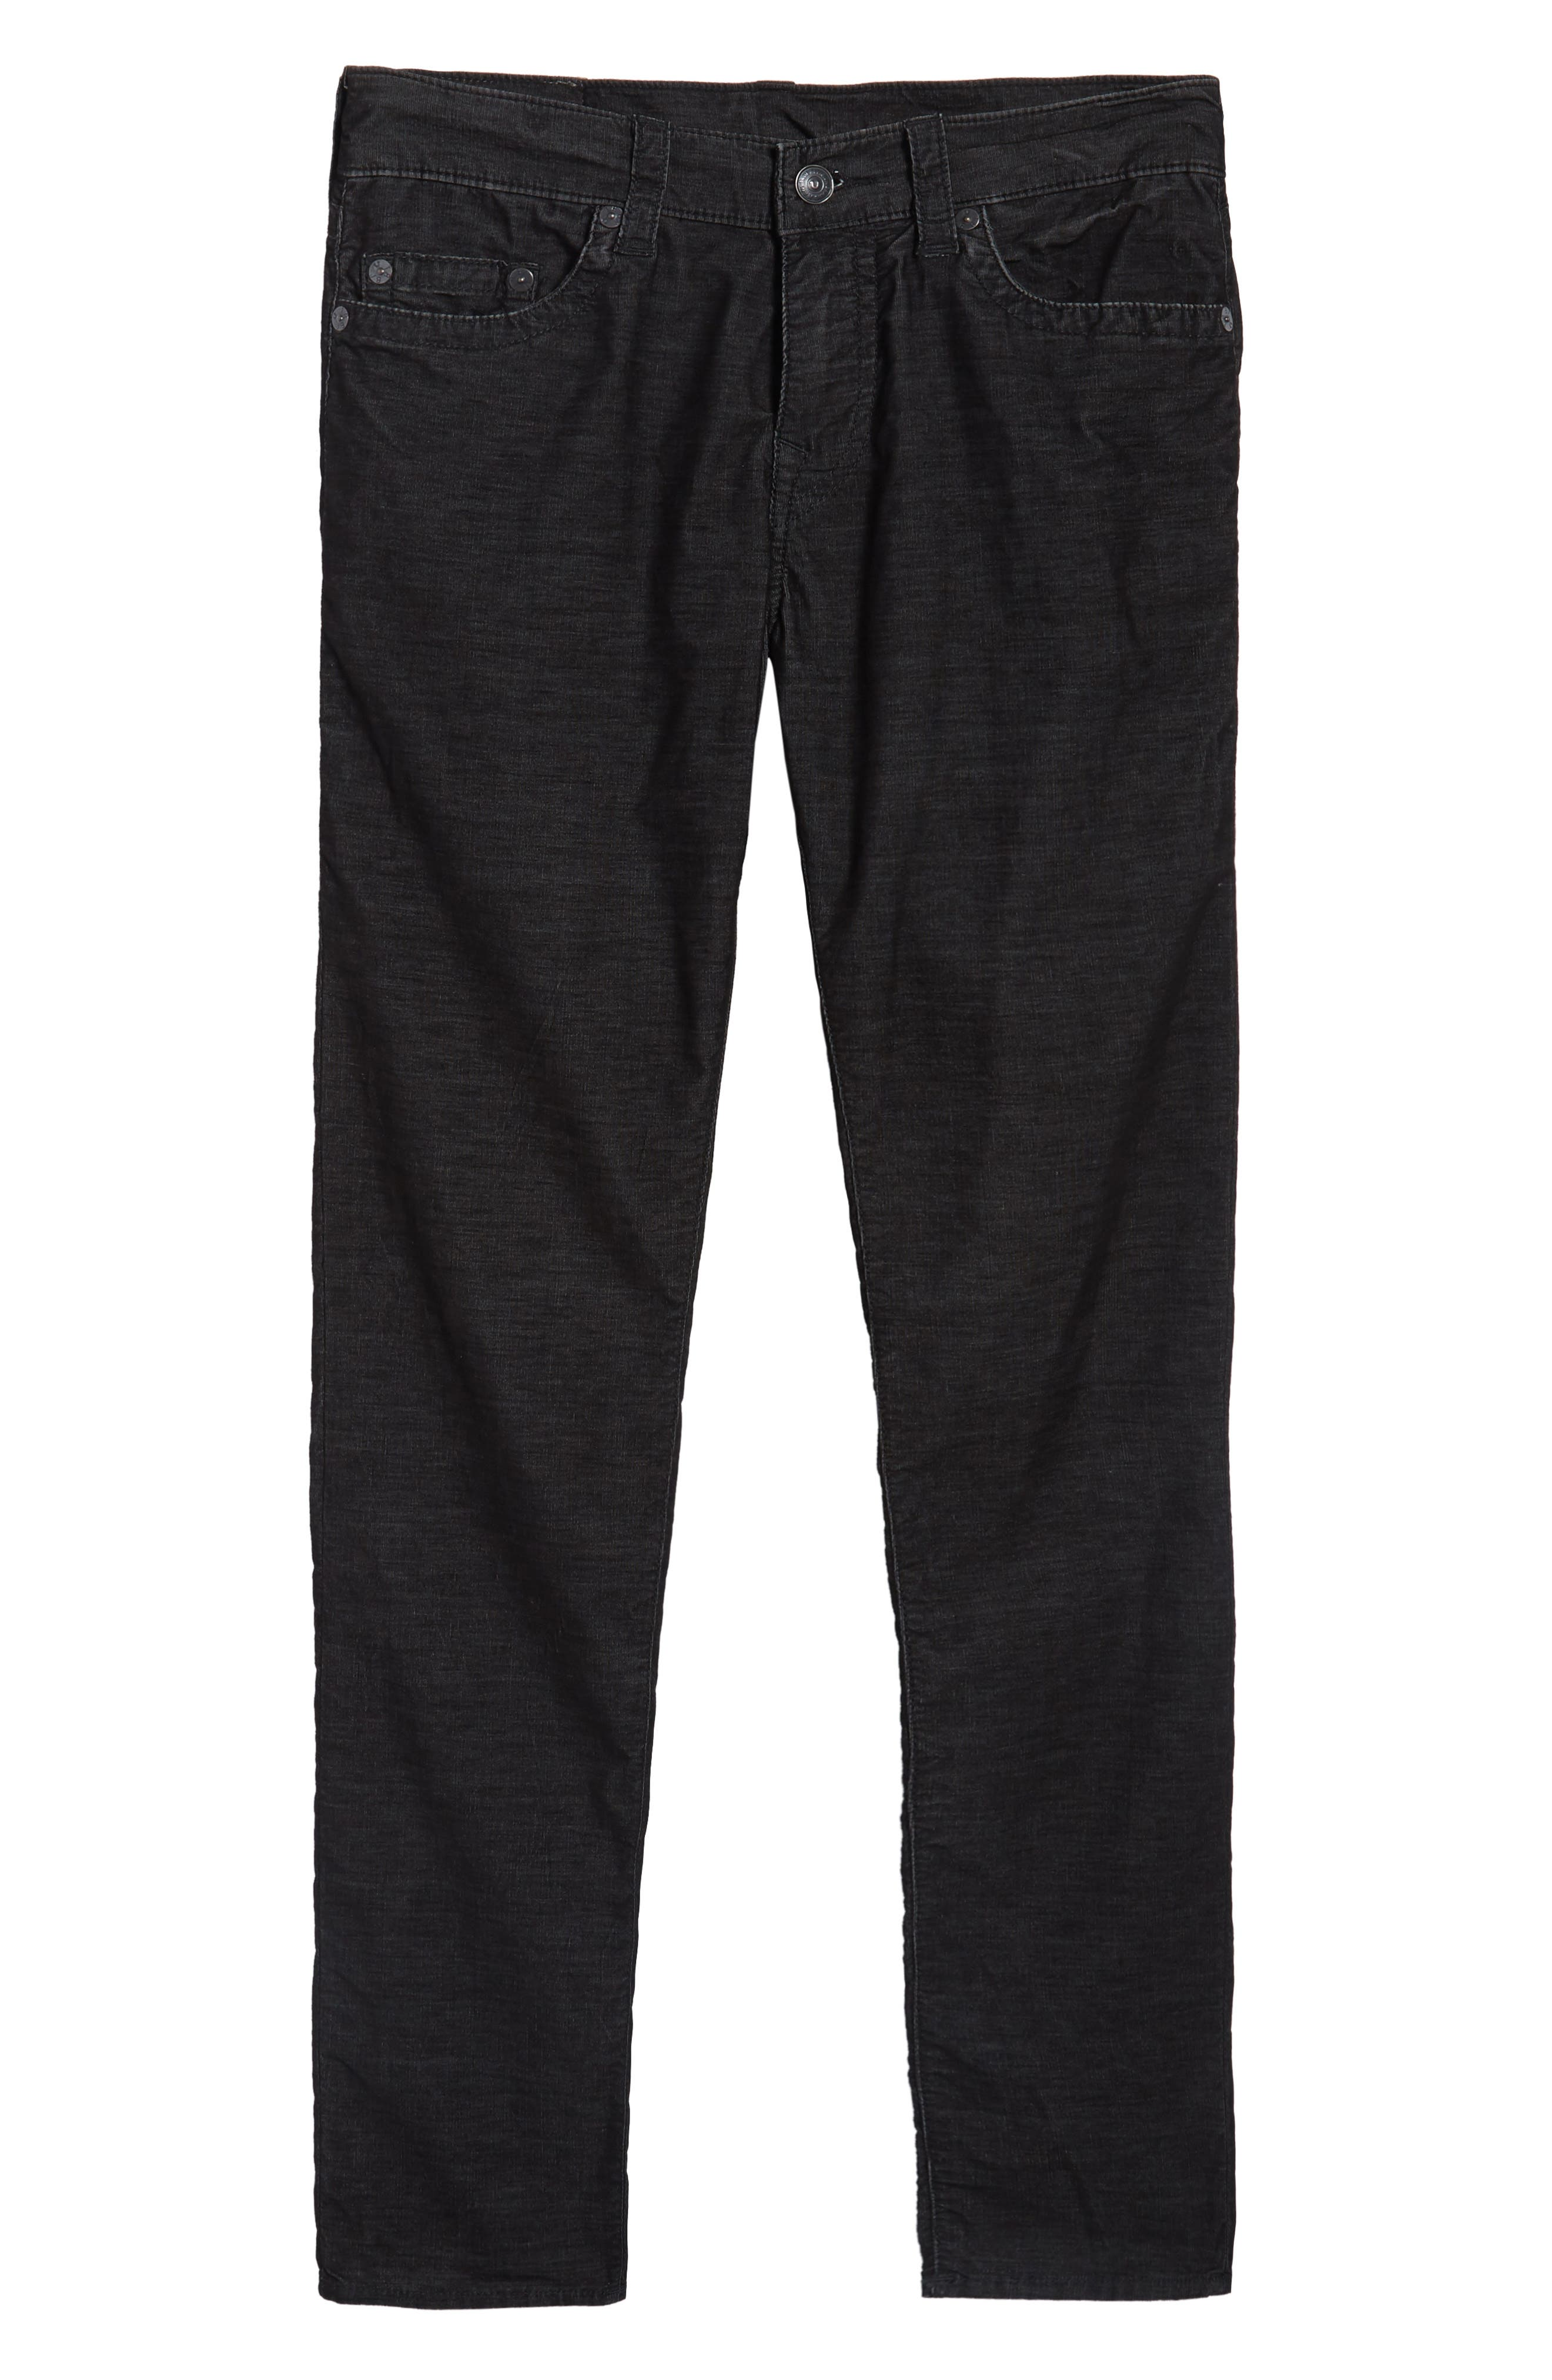 Rocco Skinny Fit Corduroy Jeans,                             Alternate thumbnail 6, color,                             Black